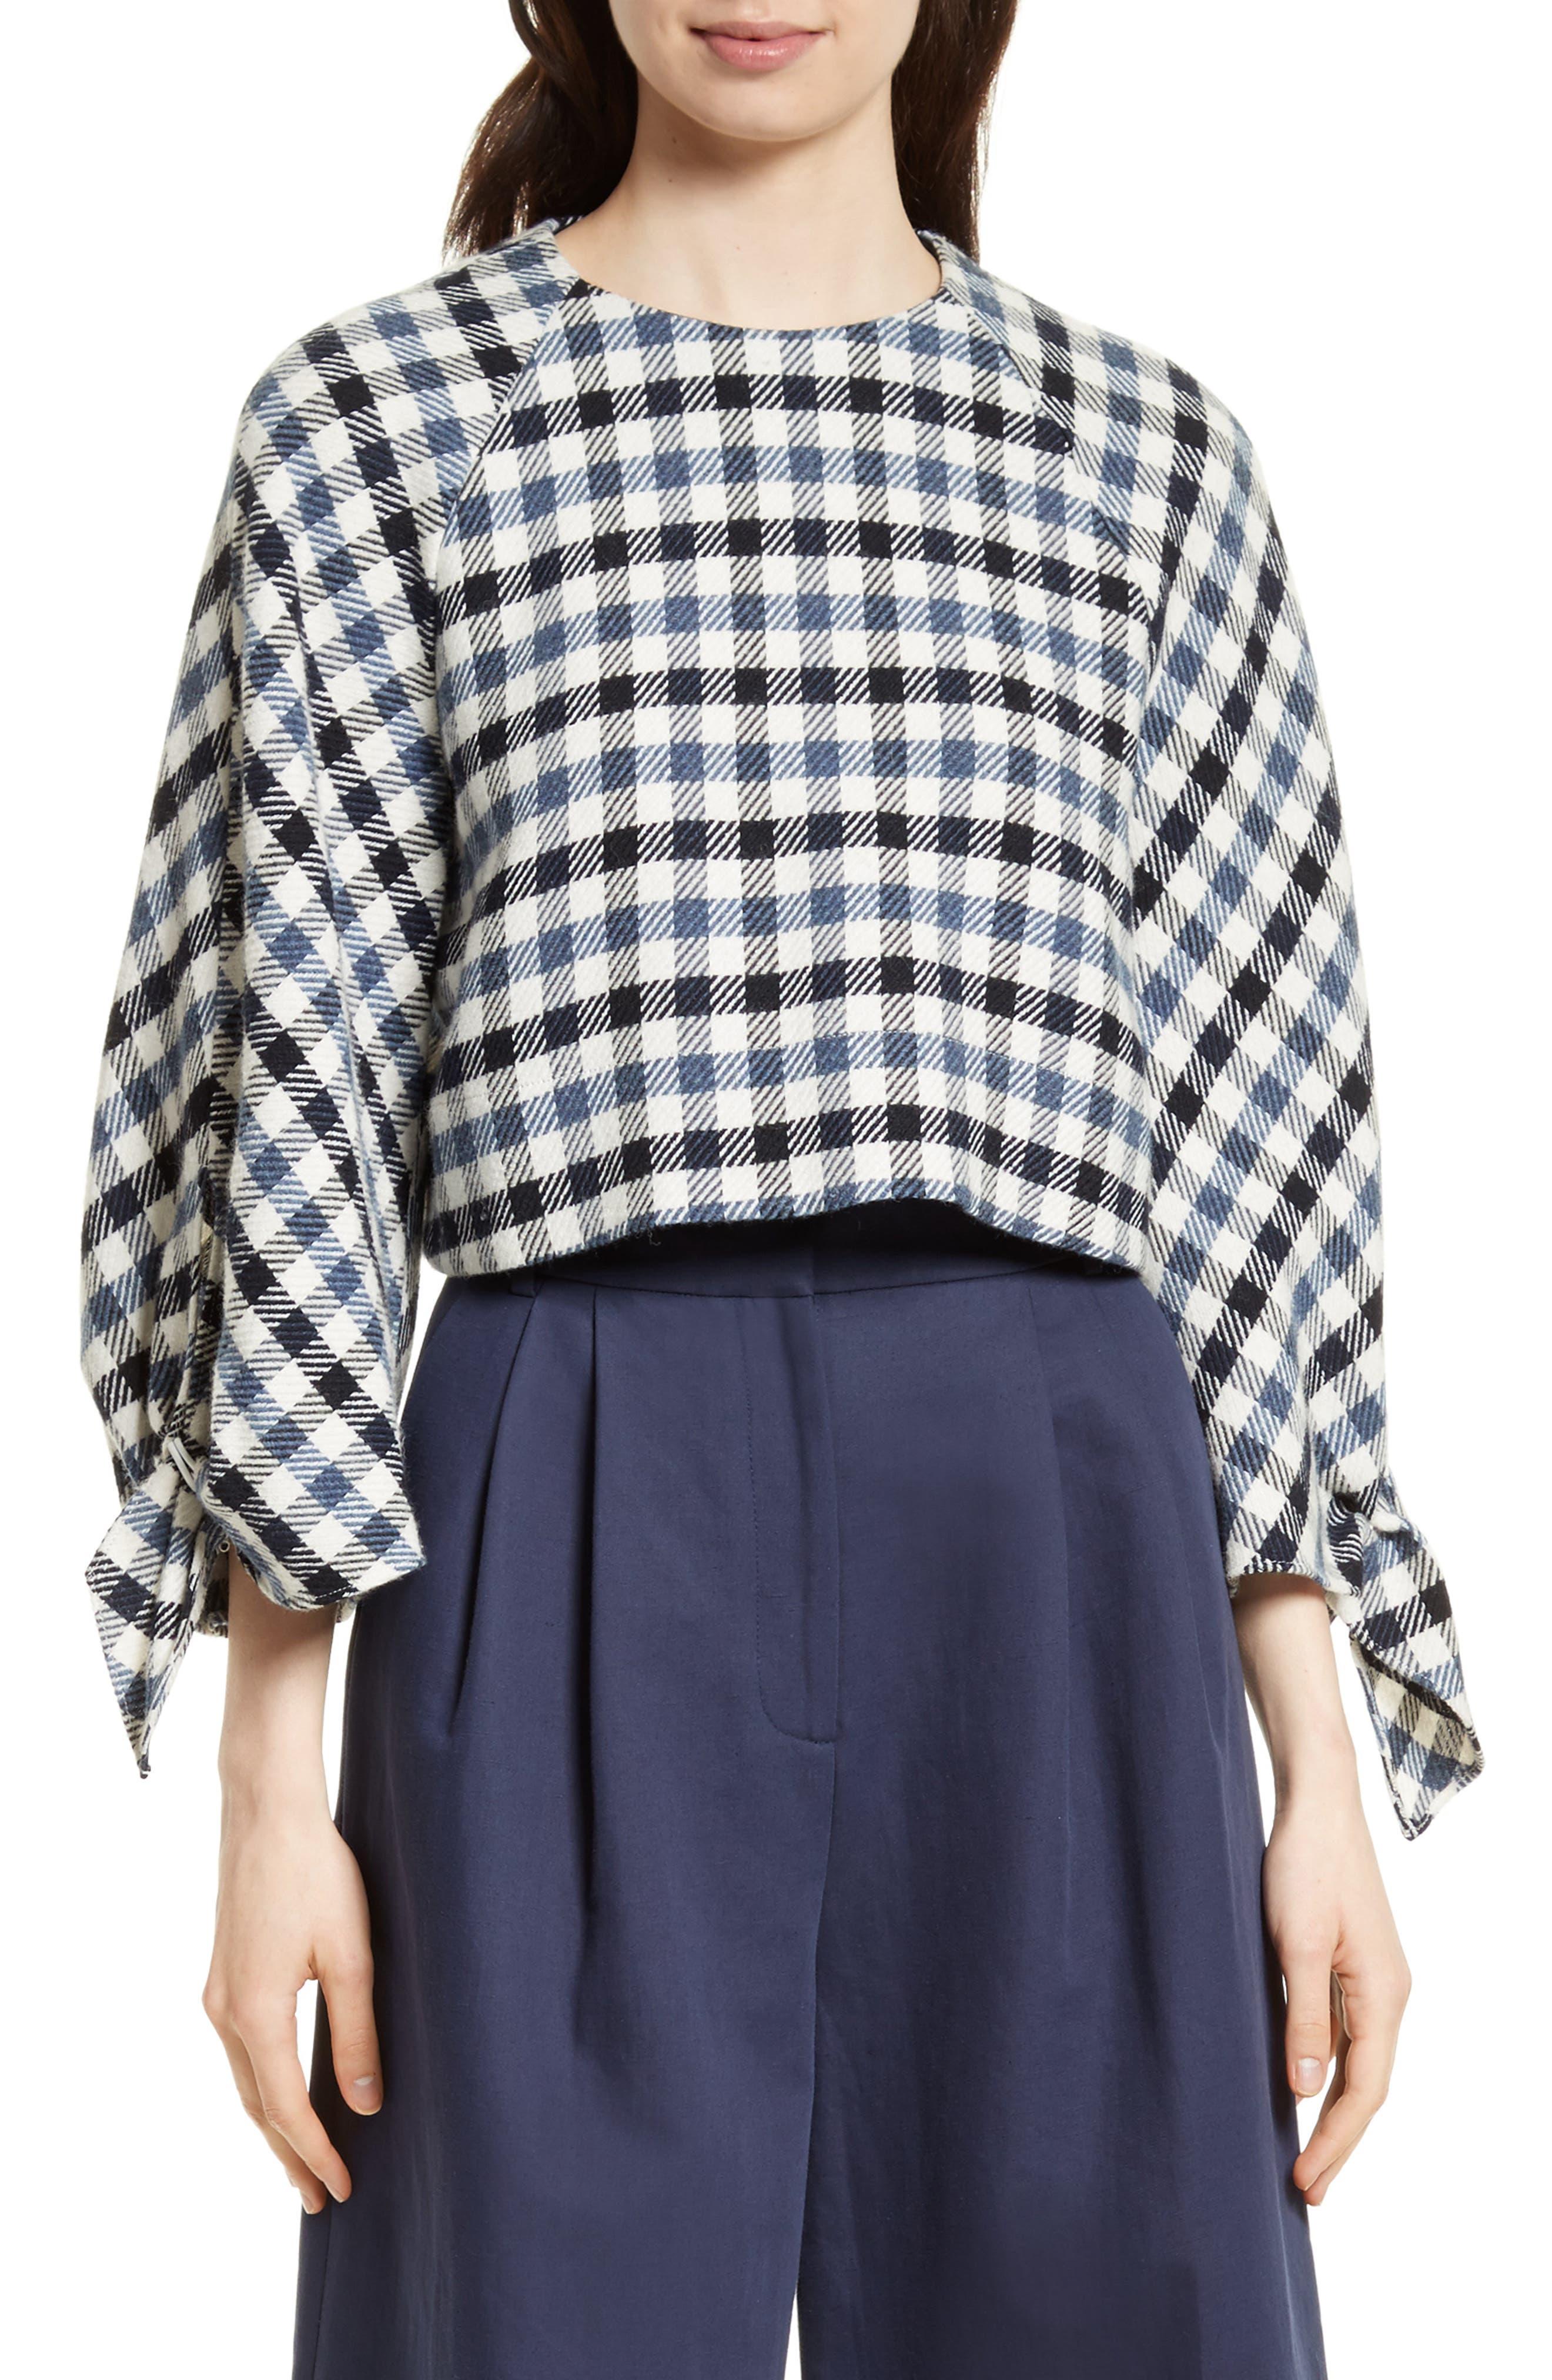 Fairfax Gingham Tie Sleeve Crop Top,                             Main thumbnail 1, color,                             Blue Multi